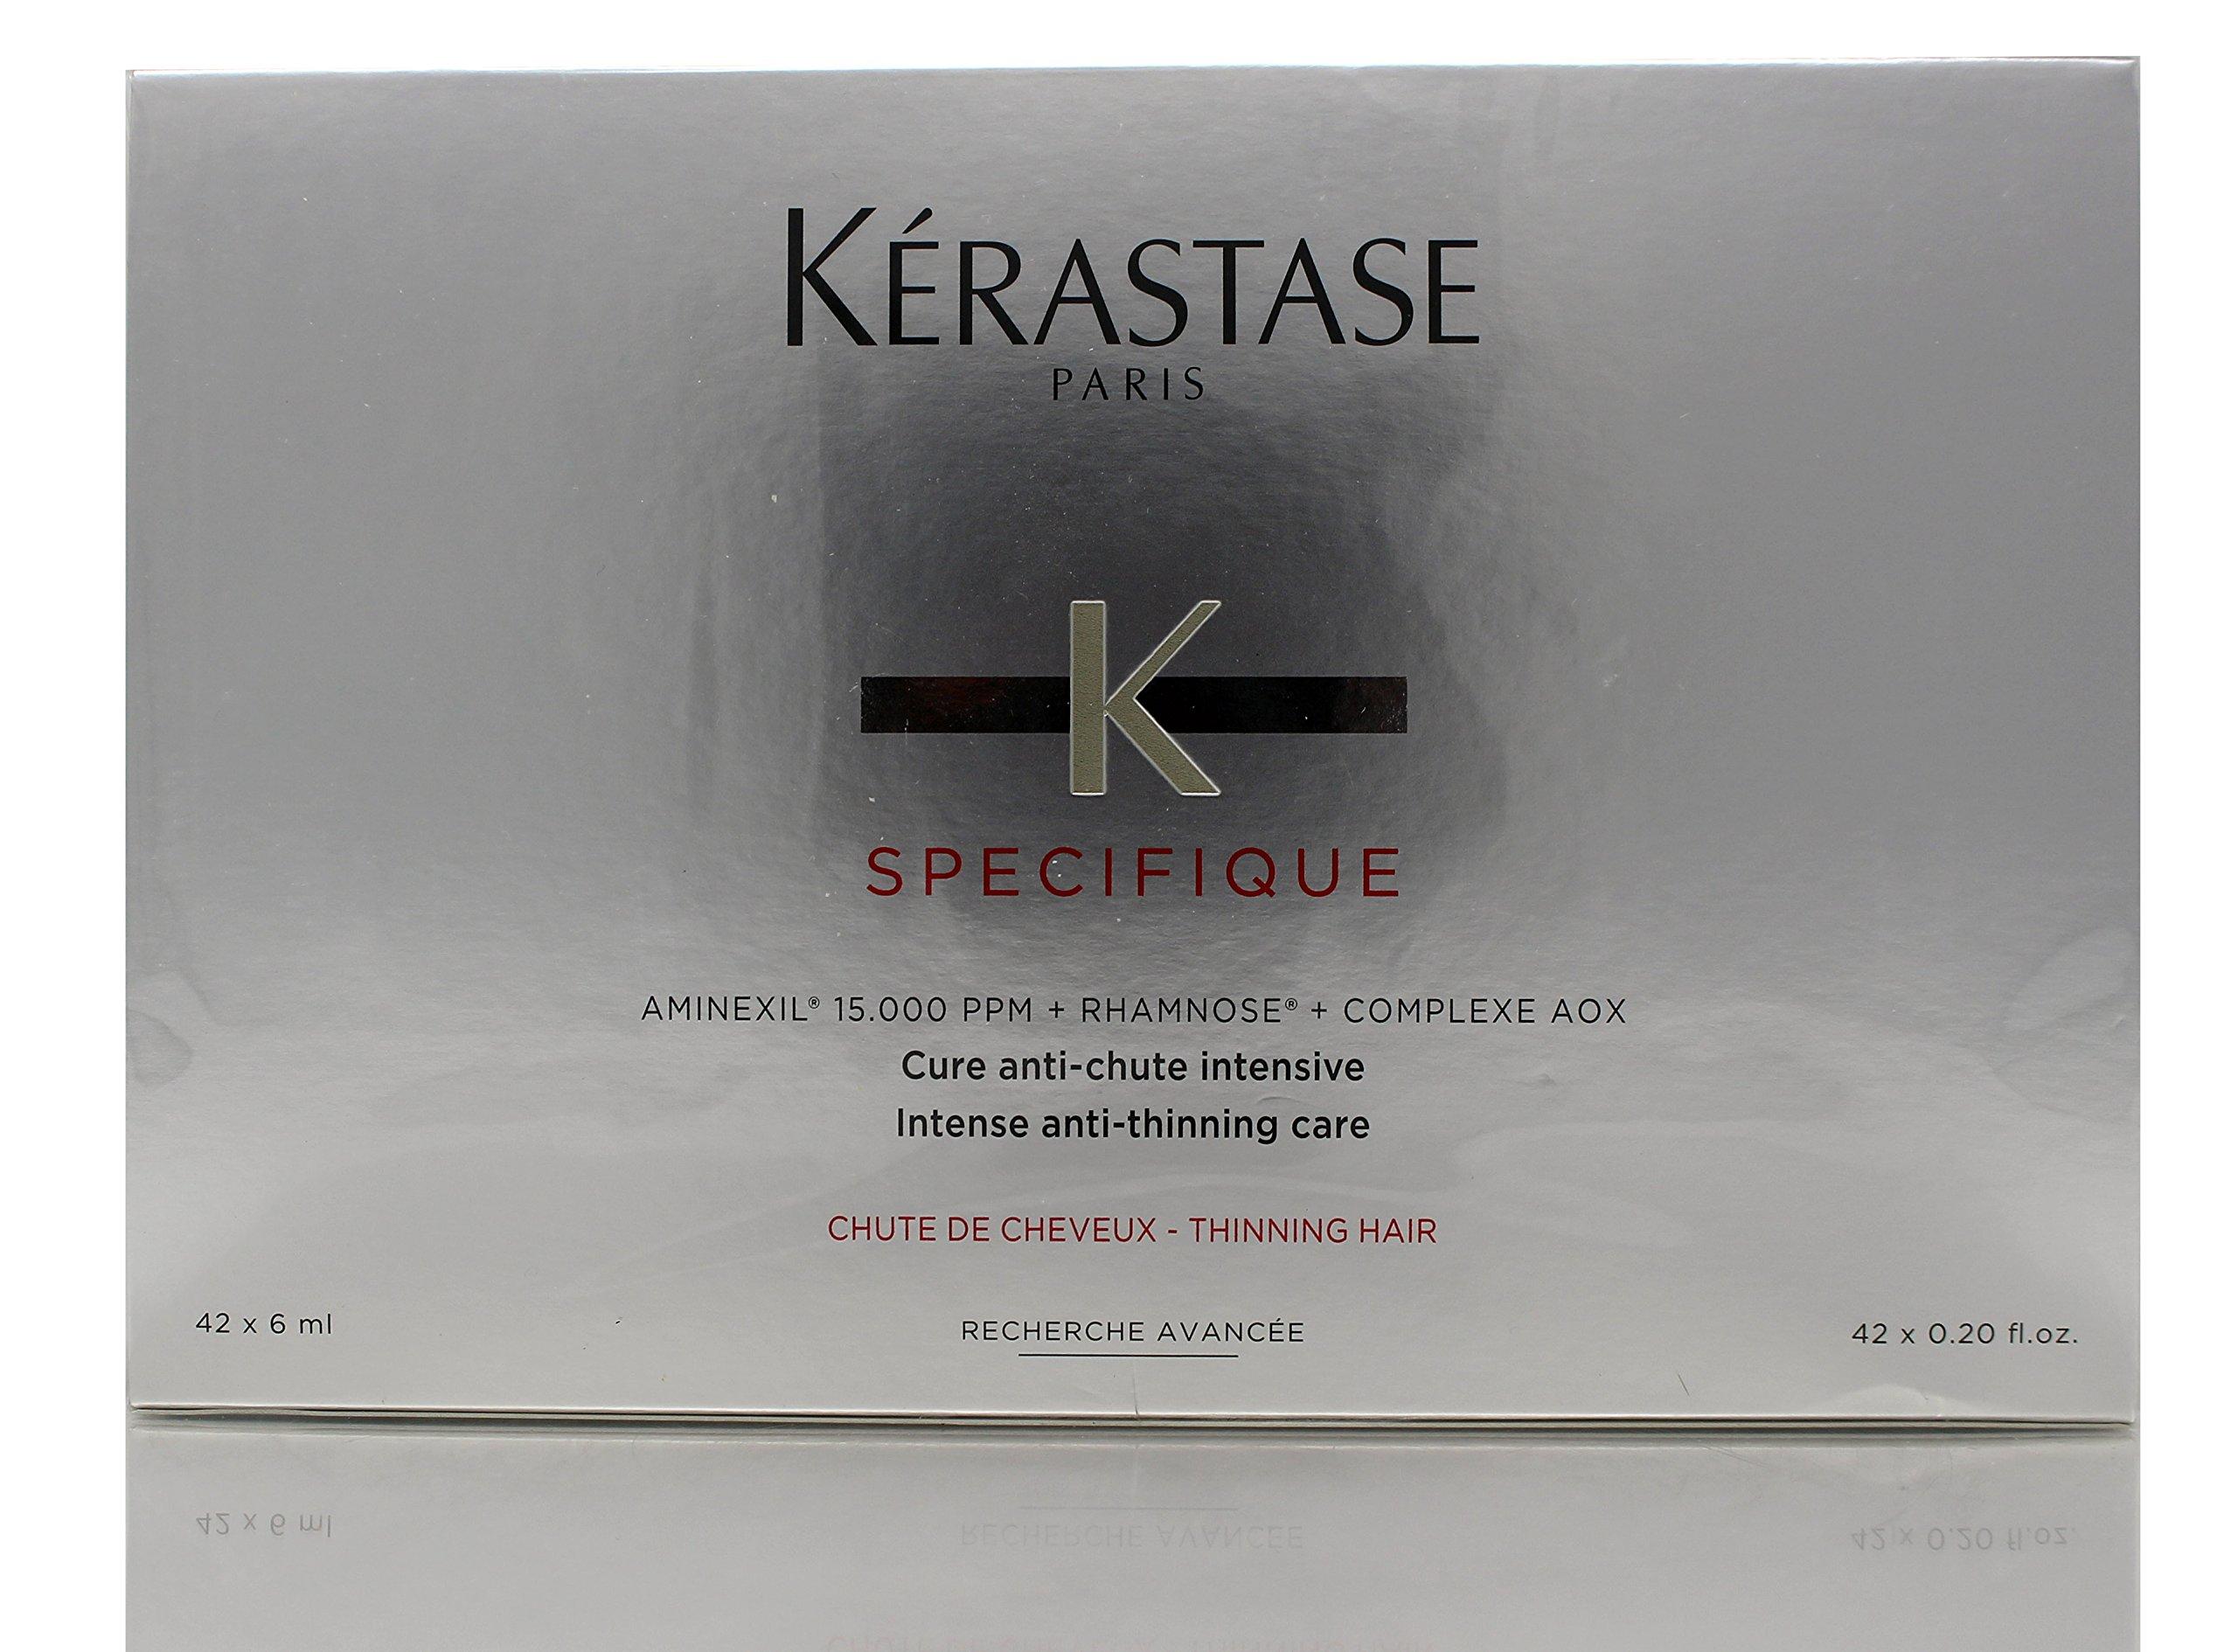 Kerastase Specifique Tratamiento Anti Caída - 252 ml product image